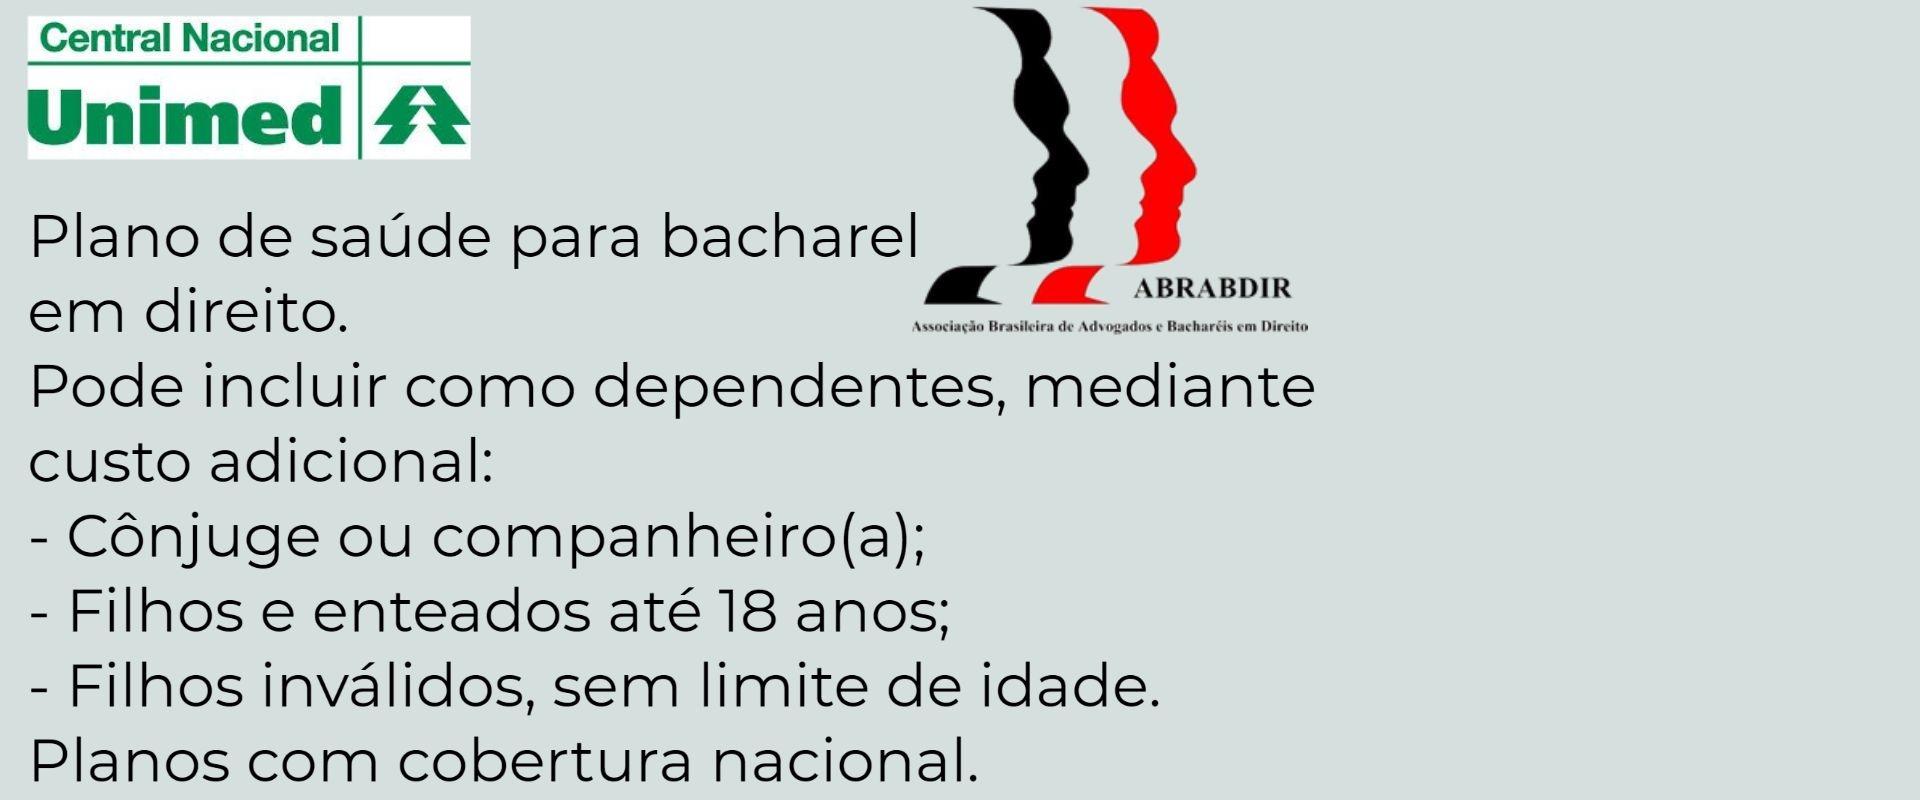 Unimed ABRABDIR Piracicaba